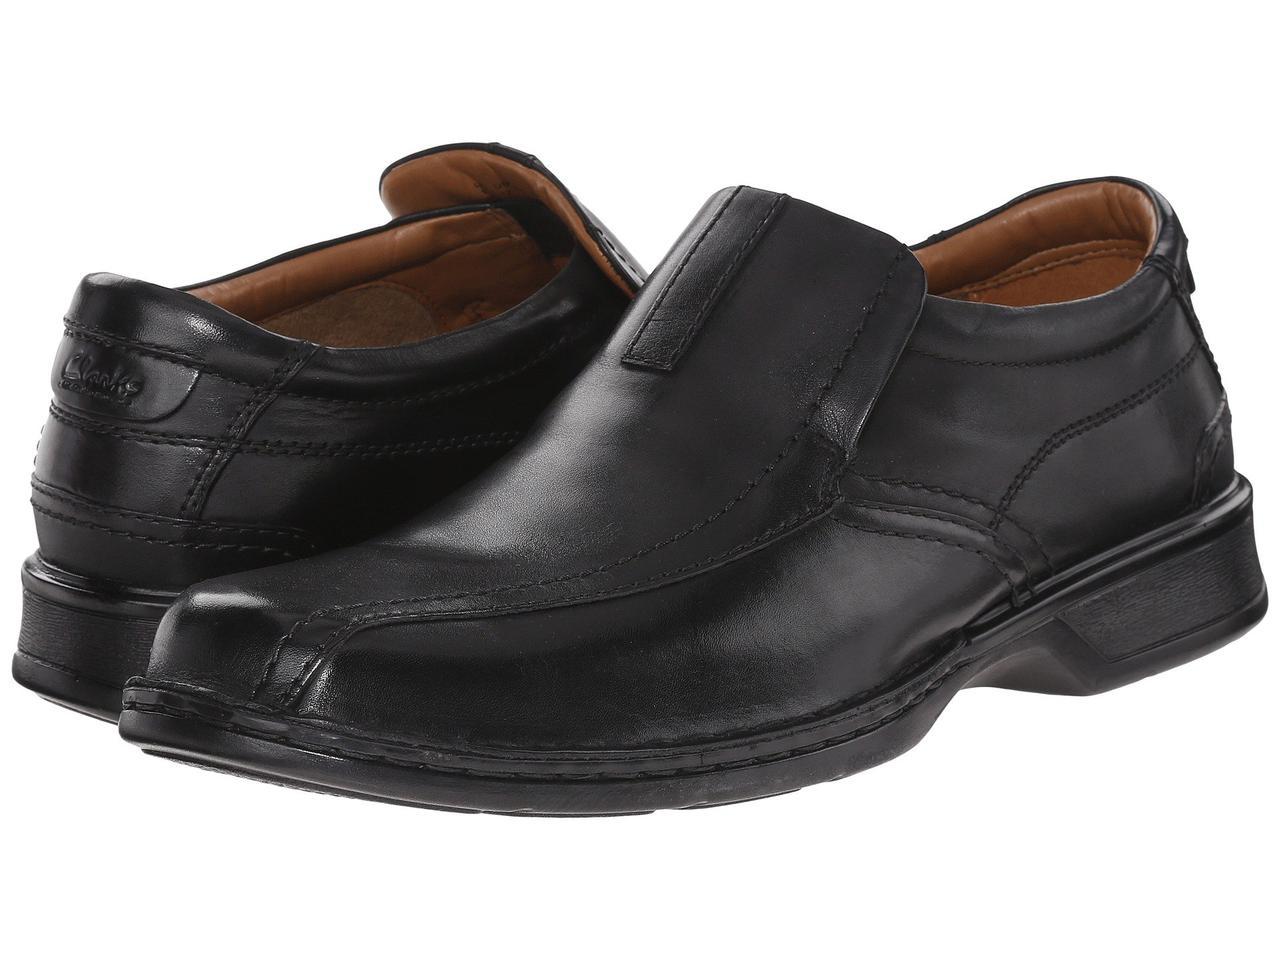 Мокасины (Оригинал) Clarks Escalade Step Black Leather